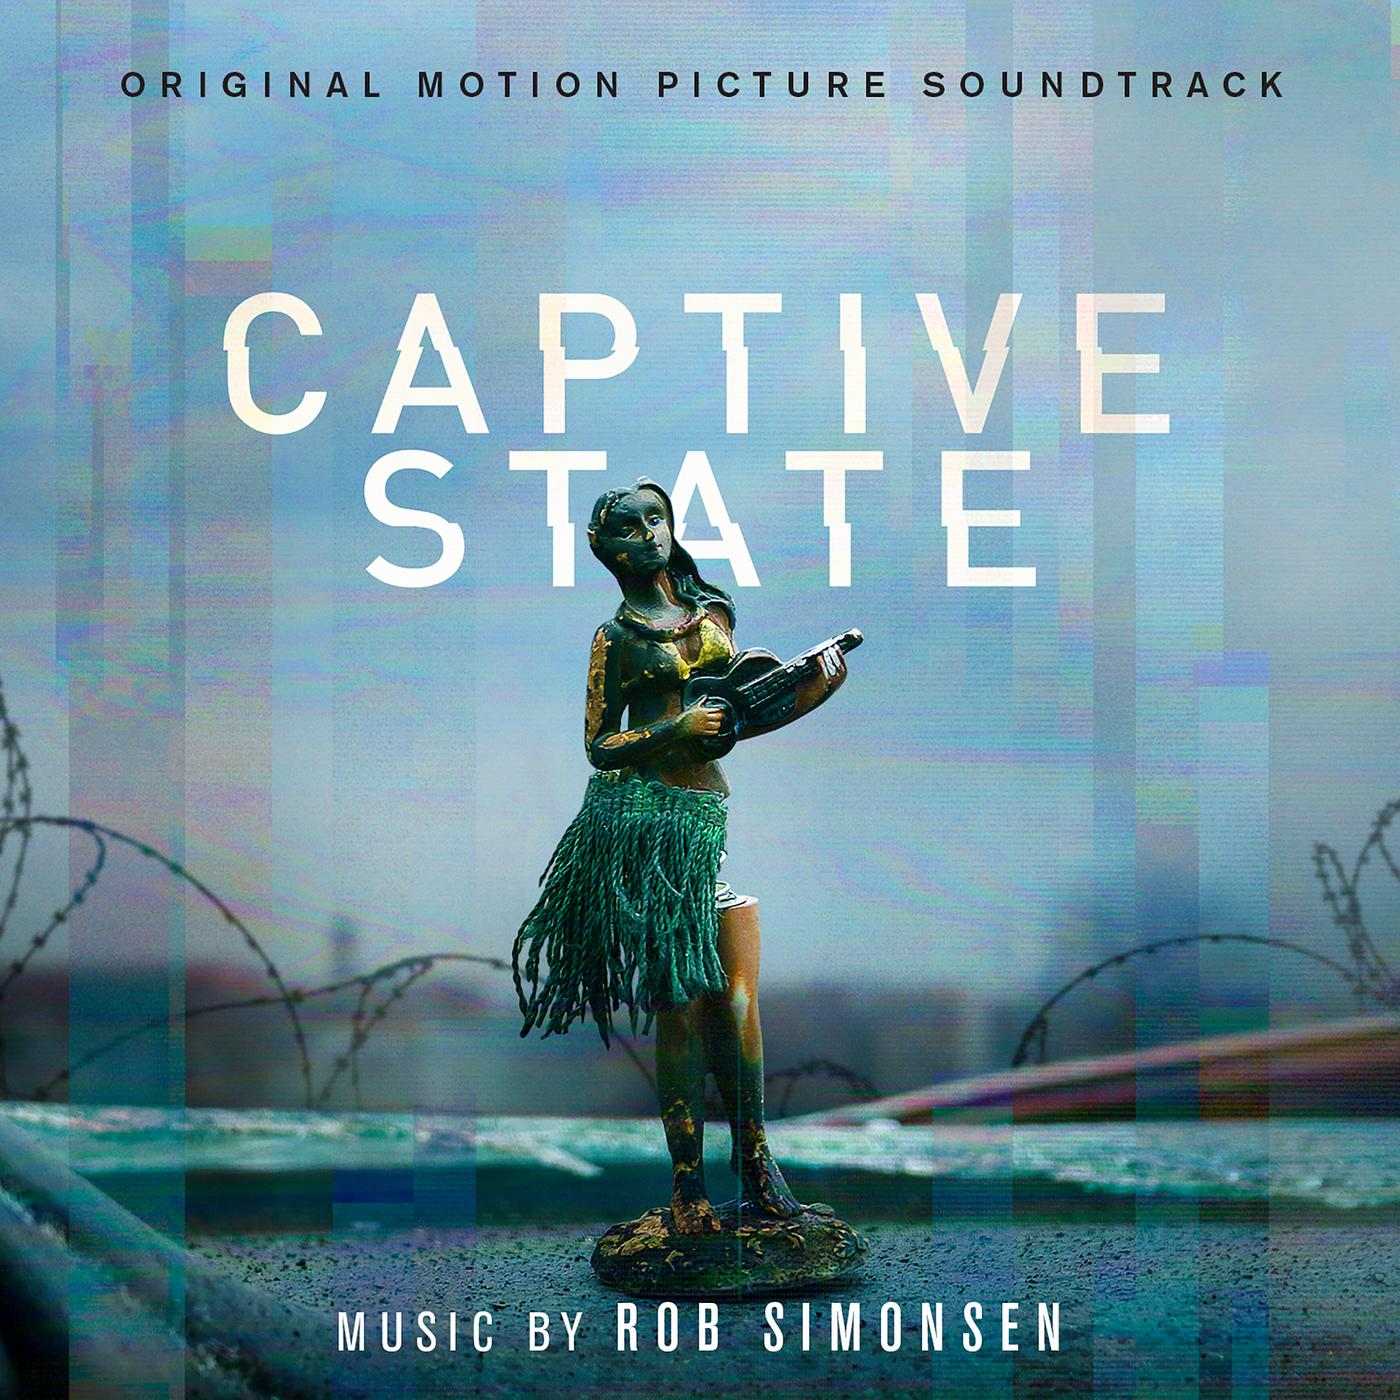 Captive State (Original Motion Picture Soundtrack) - Rob Simonsen